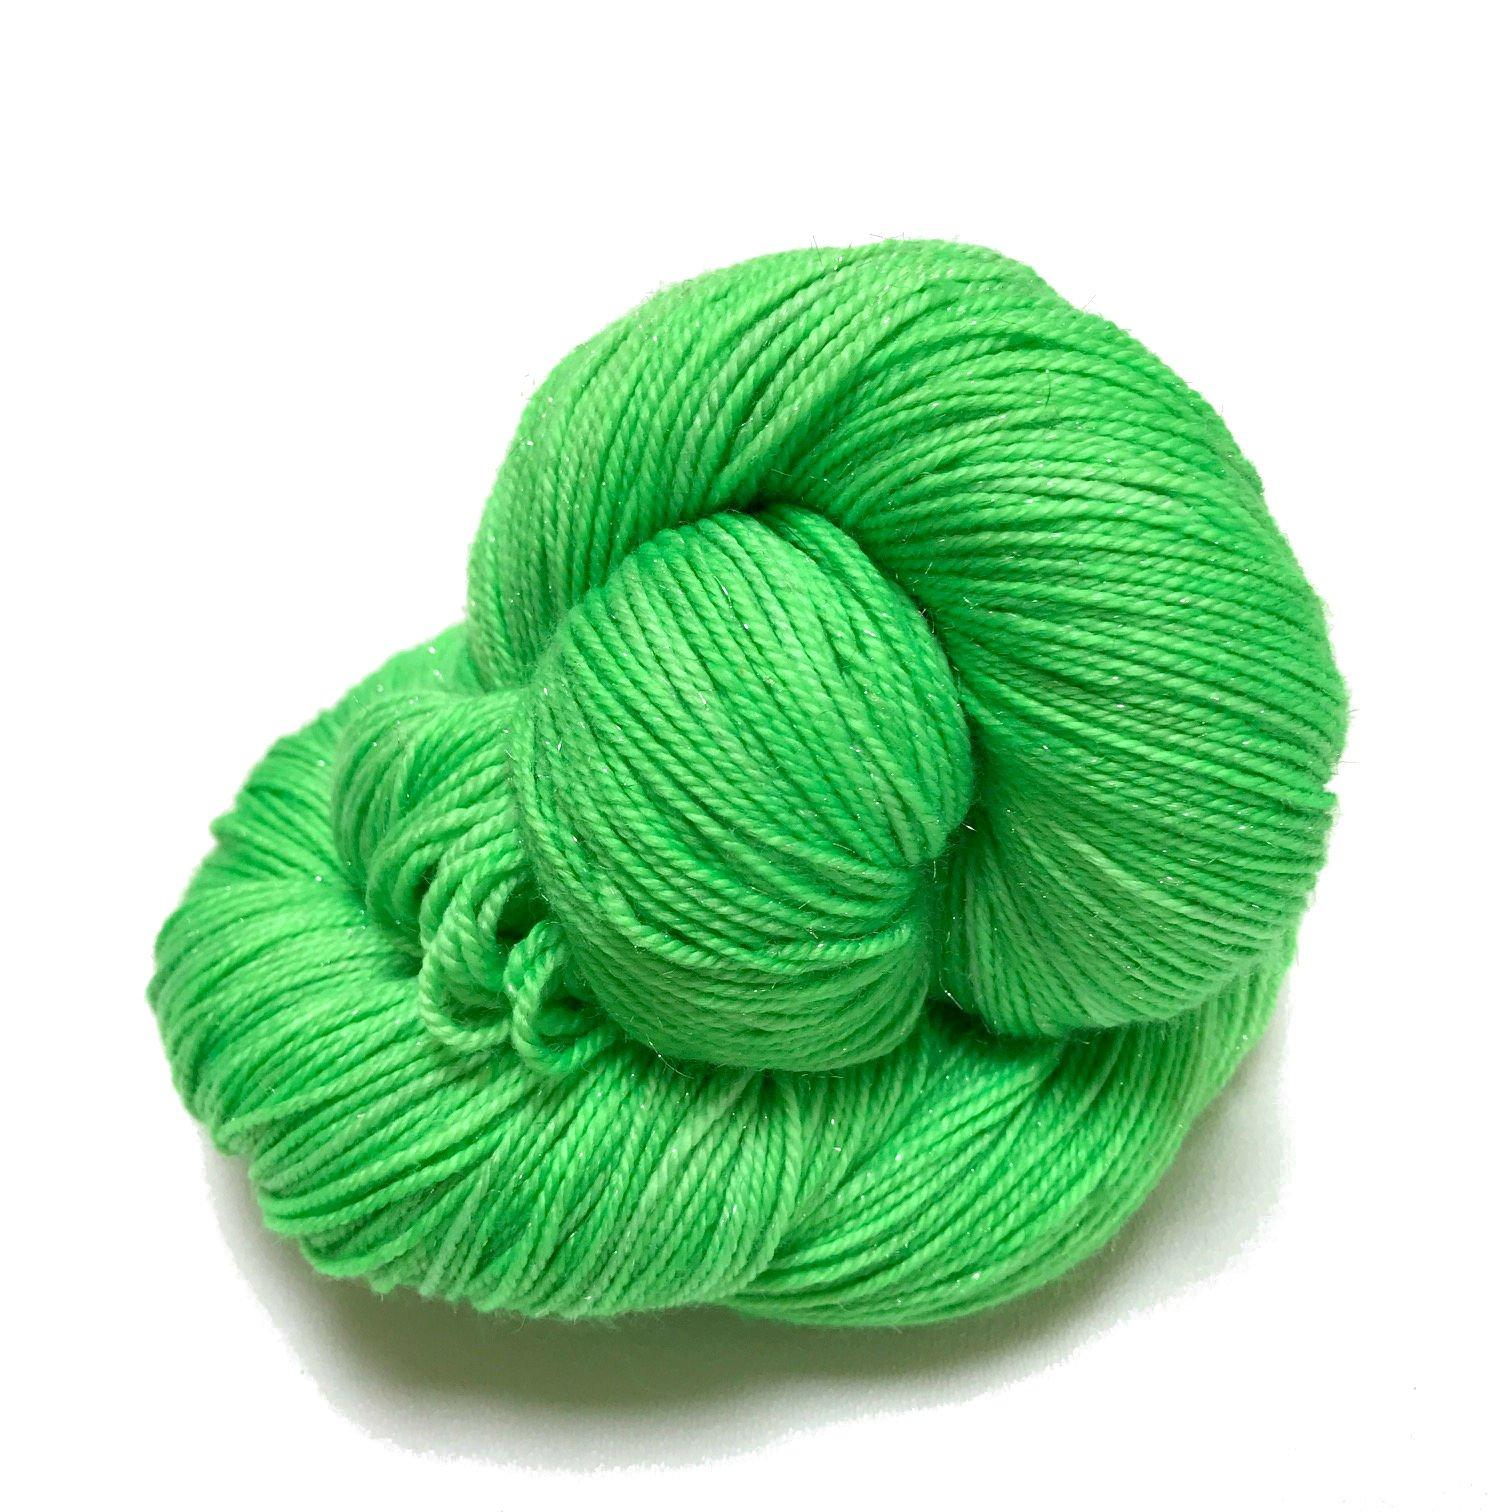 Anzula Lunaris - It Ain't Easy Being Green